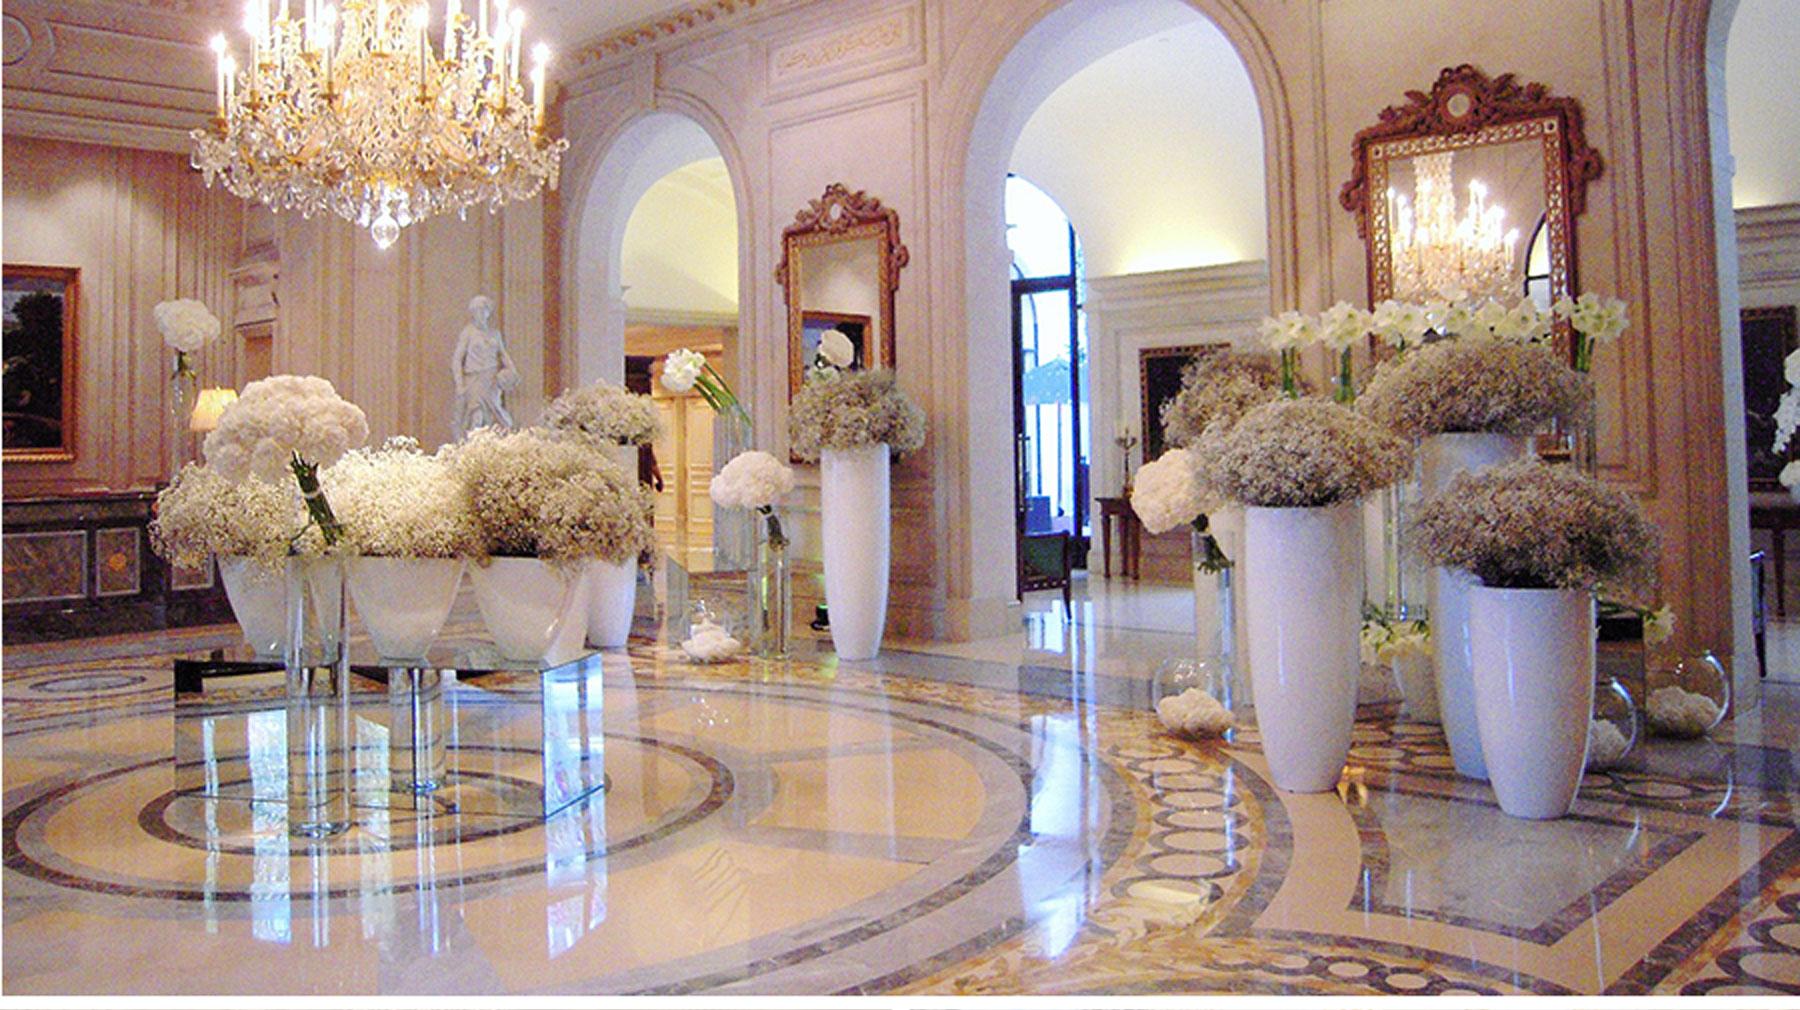 V188: Great Escapes – Four Seasons Hotel George V, Paris, France ...: www.cecinewyork.com/cecistyle/2014/03/04/v188-great-escapes-four...